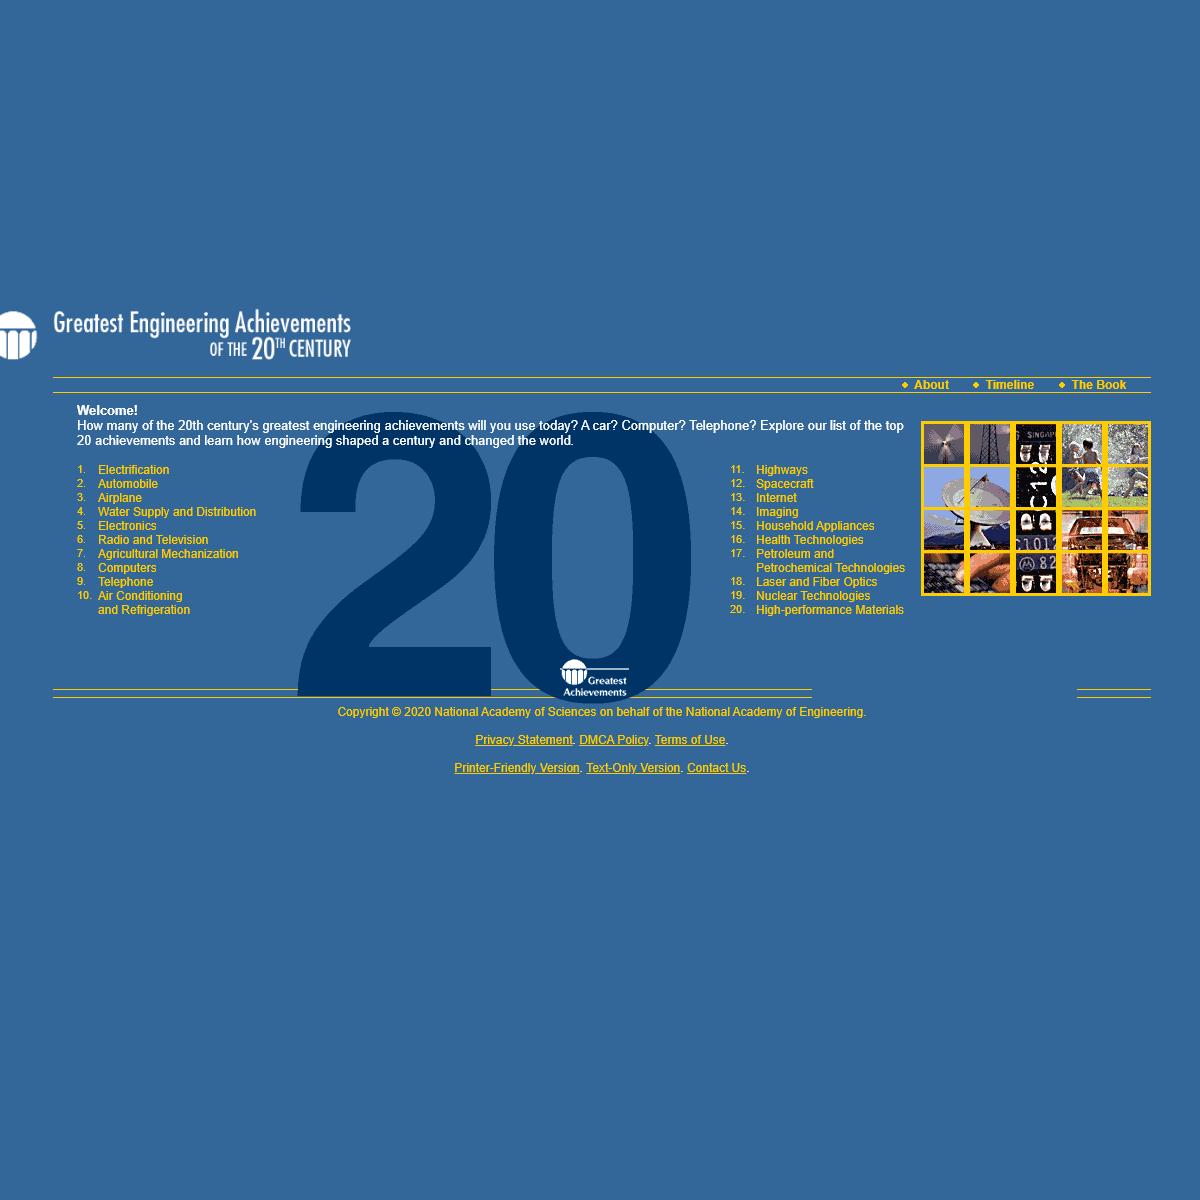 Greatest Engineering Achievements of the Twentieth Century